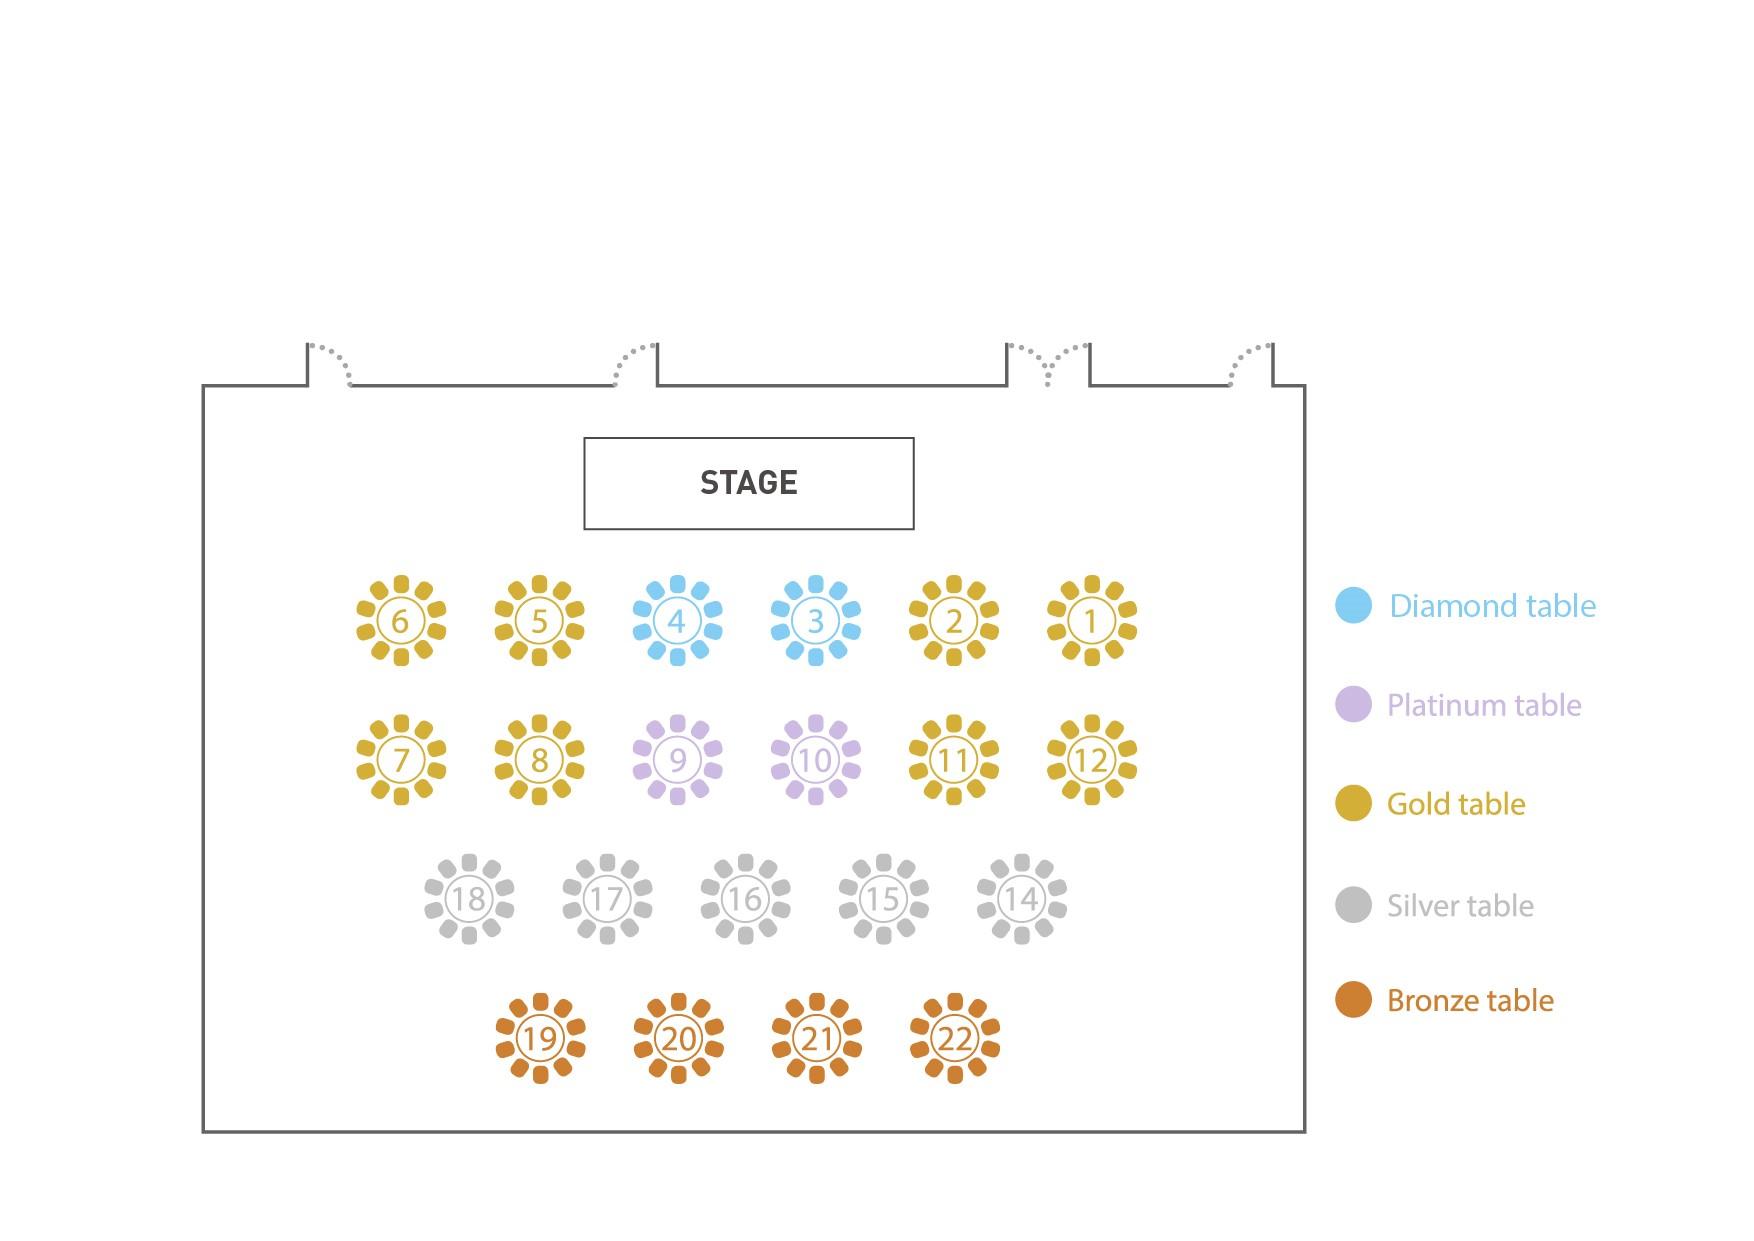 Table plan image